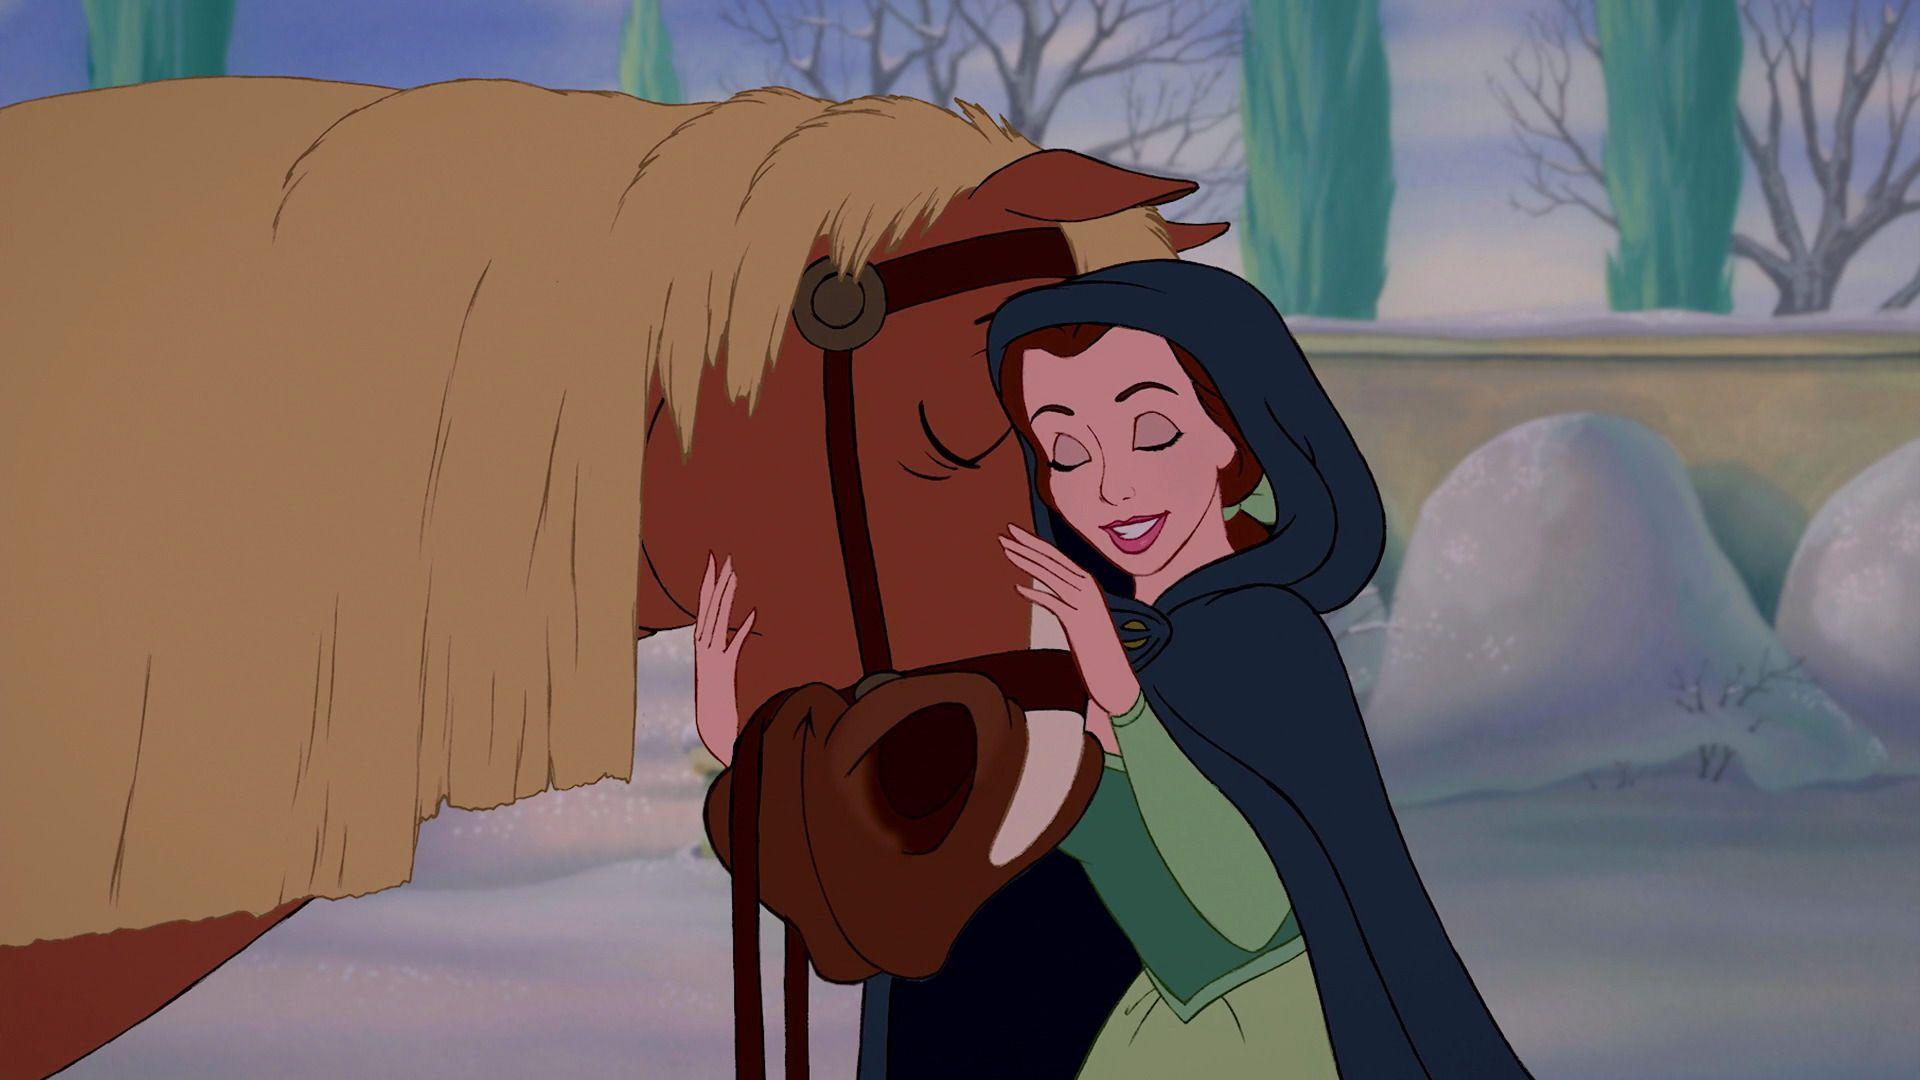 Philippe/Gallery | Disney Wiki | Fandom in 2020 | Disney horses, Disney  art, Disney beauty and the beast